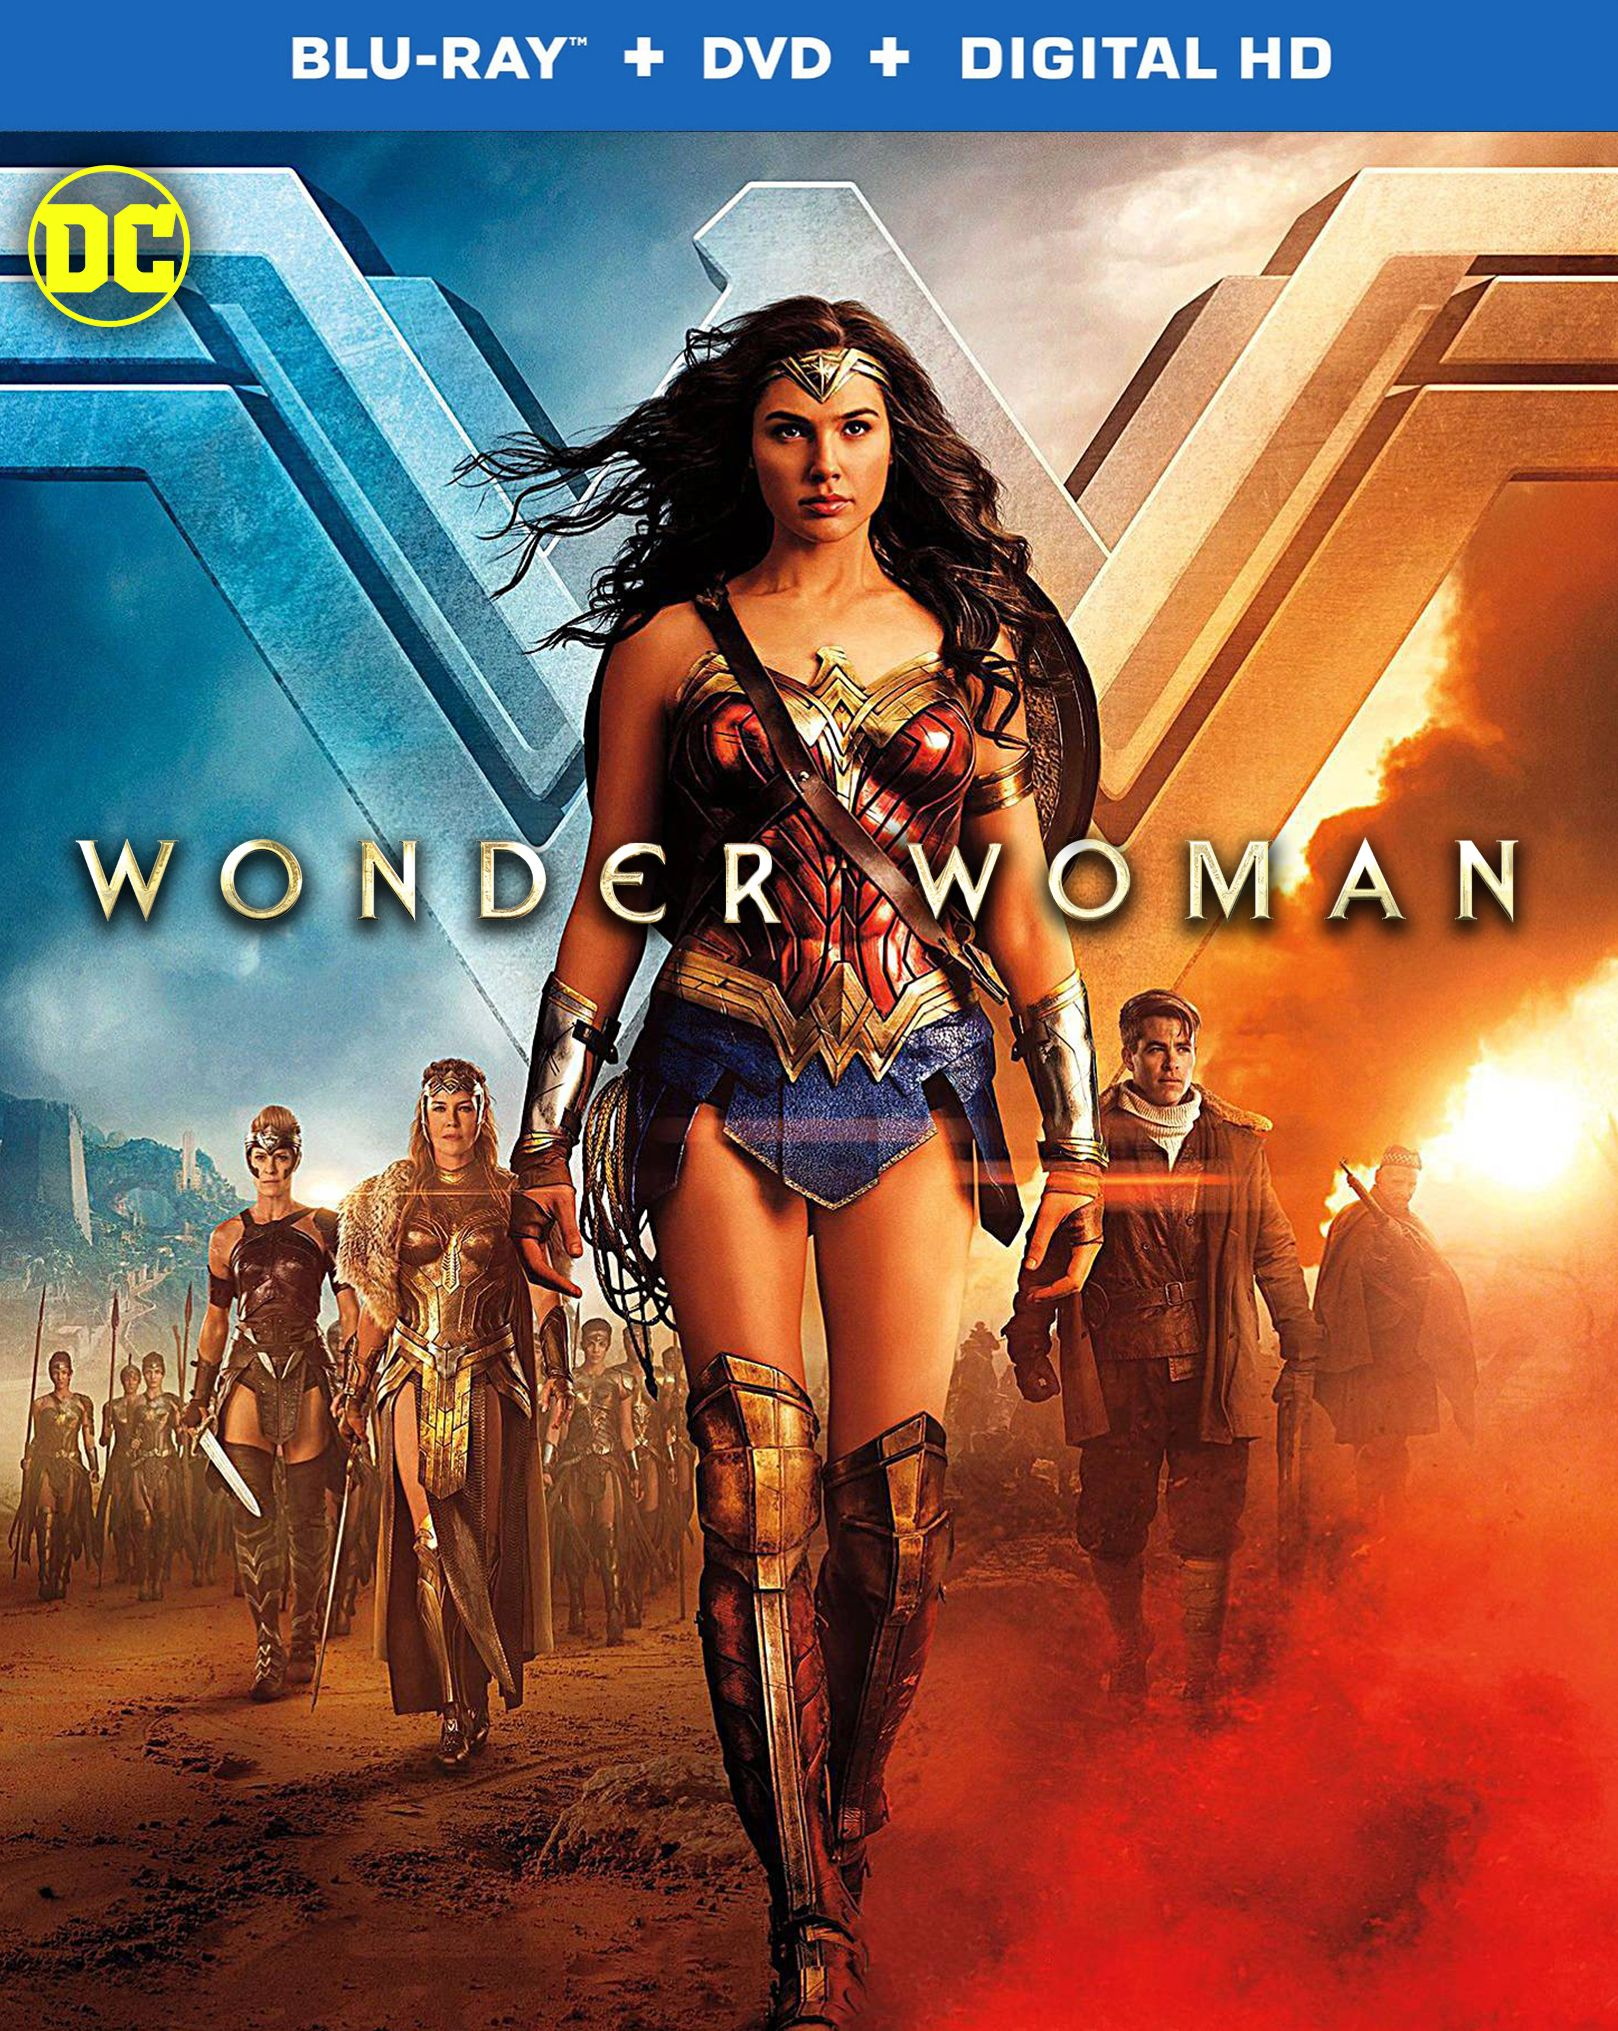 Wonder Woman Hd Version From Amazon Videos Not Physical Copy Wonder Woman Movie Wonder Woman Gal Gadot Wonder Woman